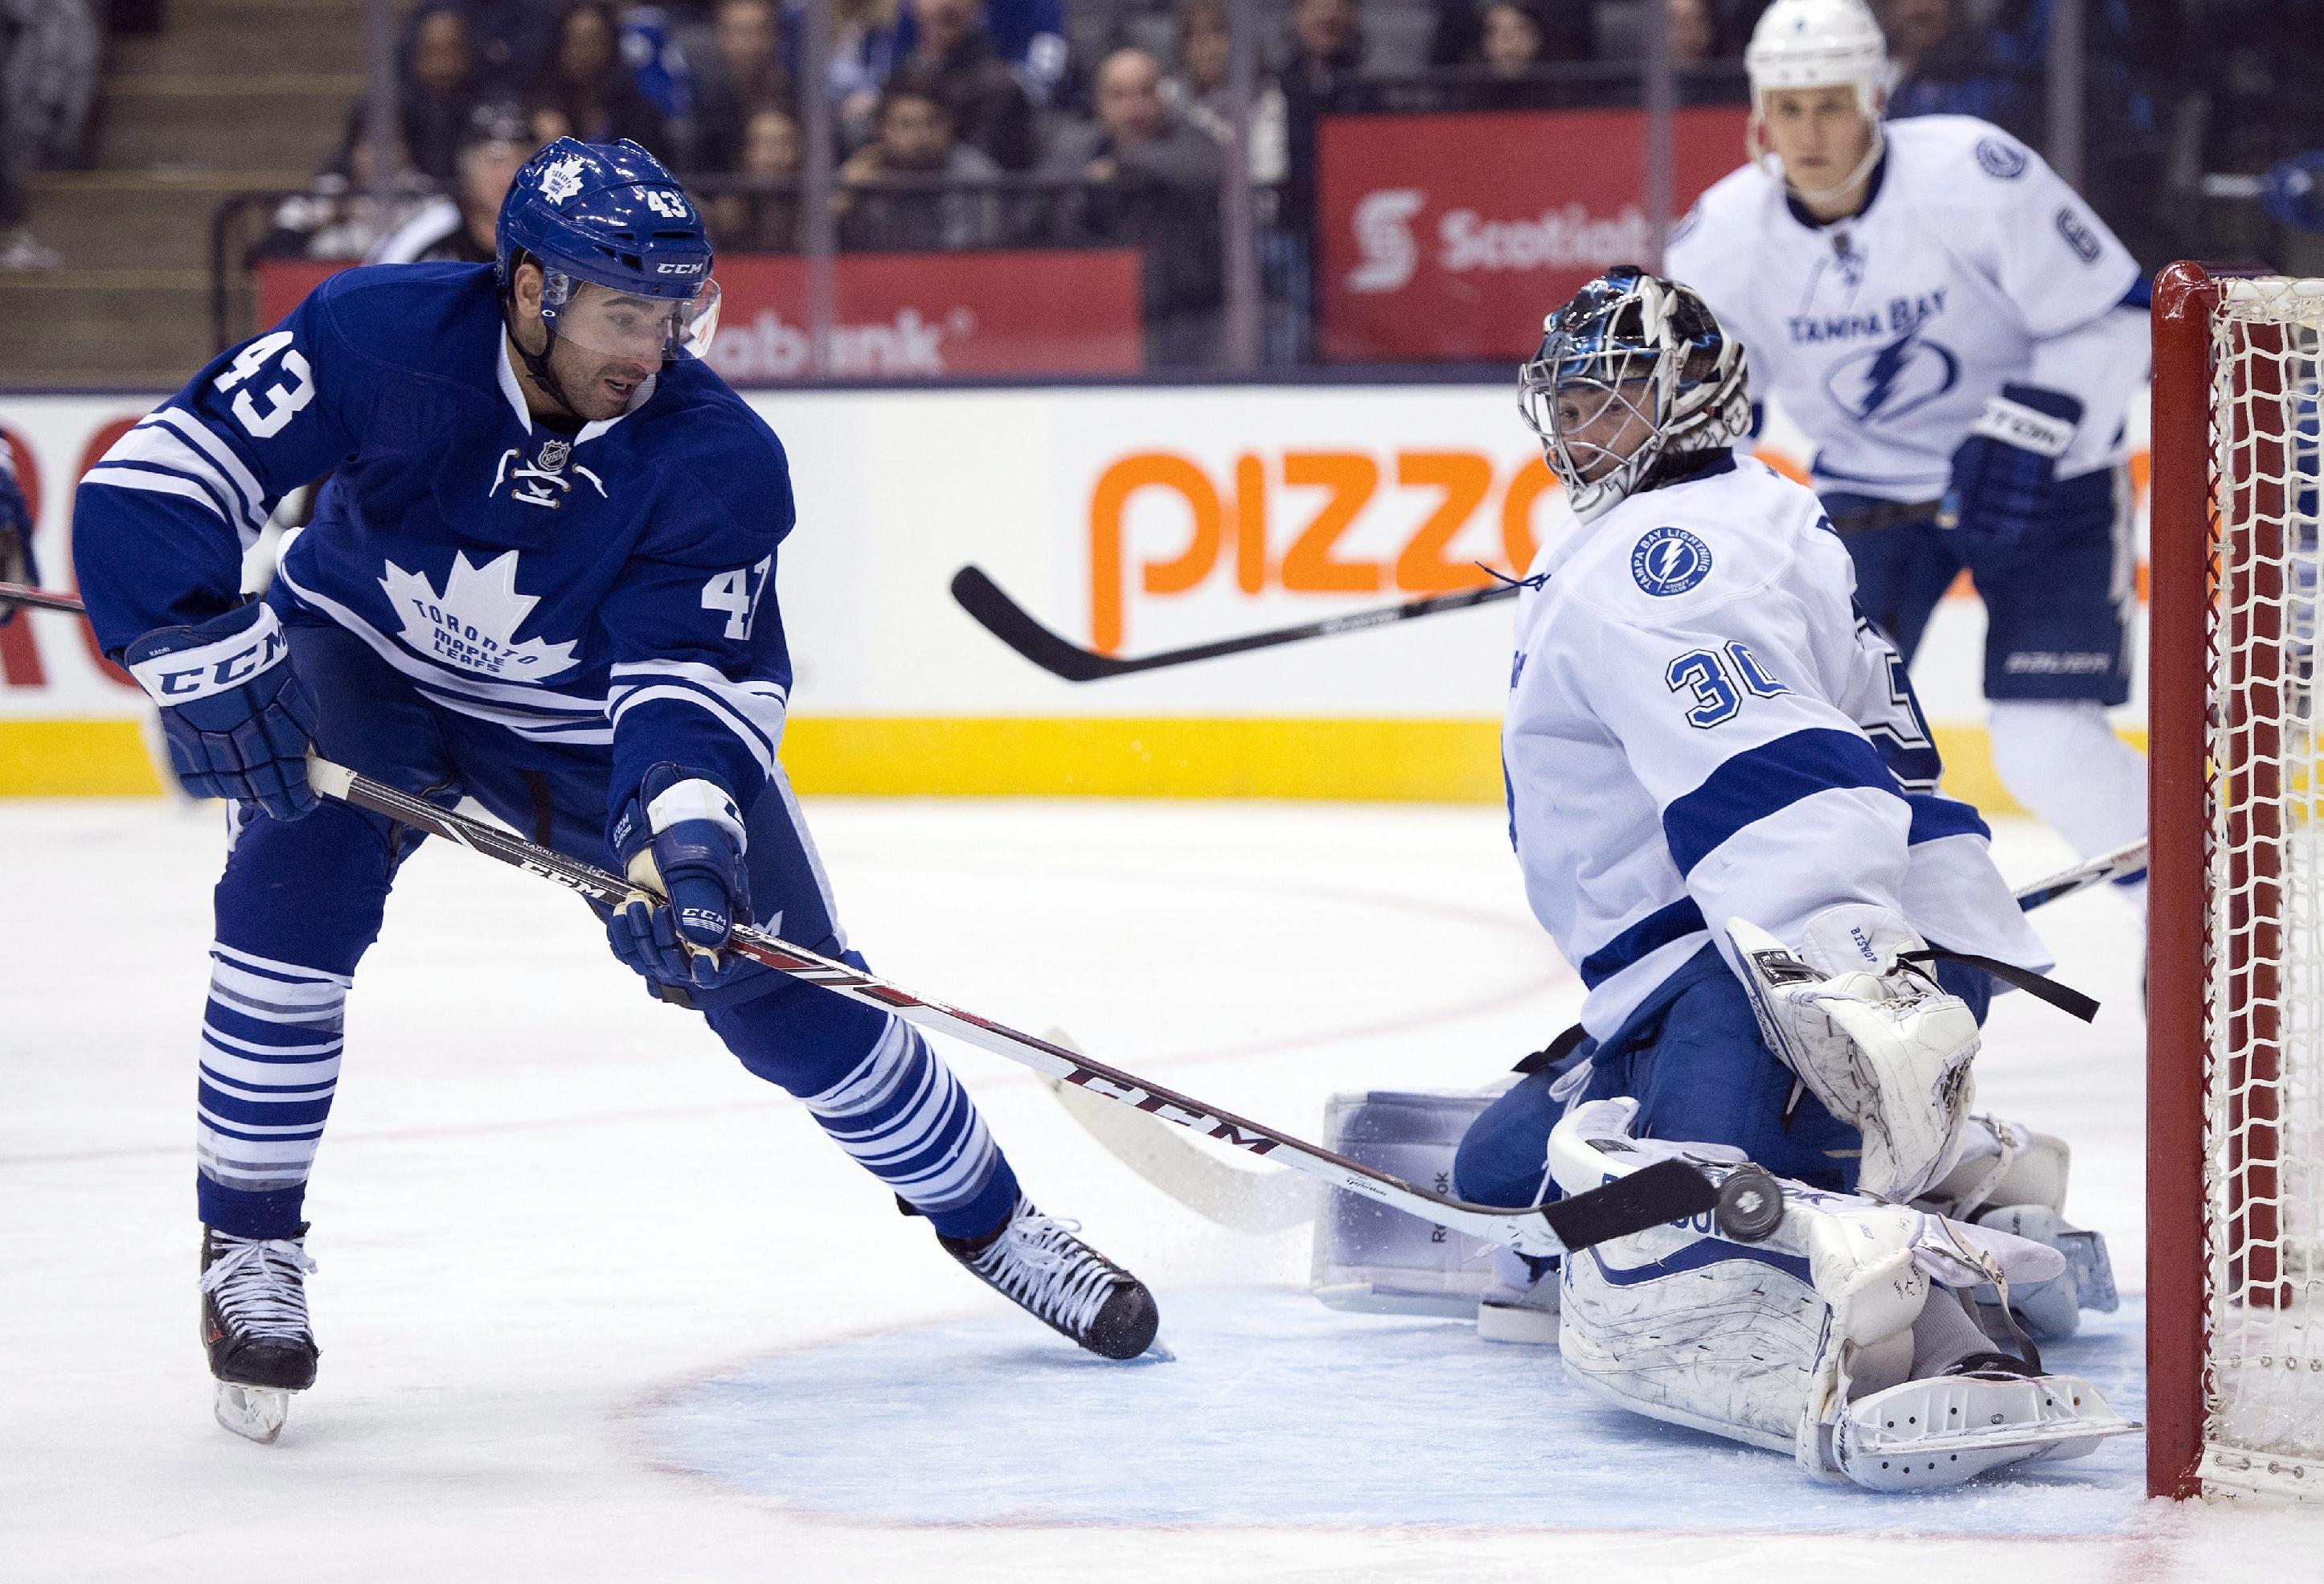 Kadri, van Riemsdyk lift Leafs over Lightning 3-2